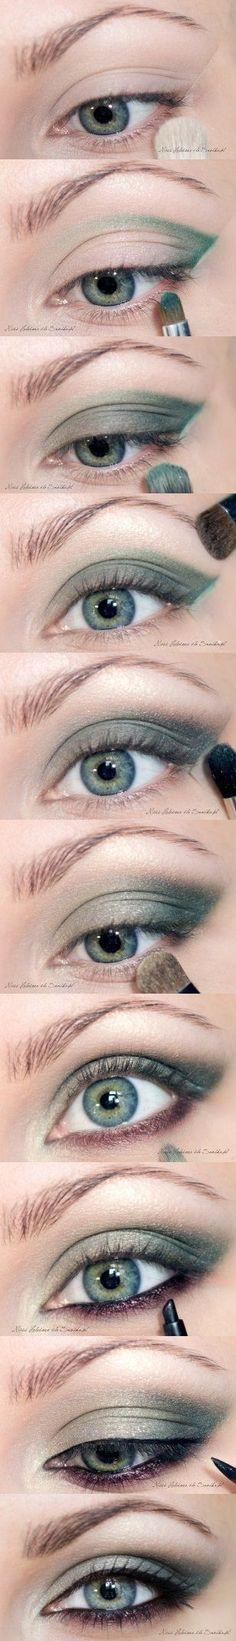 Emerald Smokey Eyes - Eye Make Up Tutoria                                                                                                                                                      More